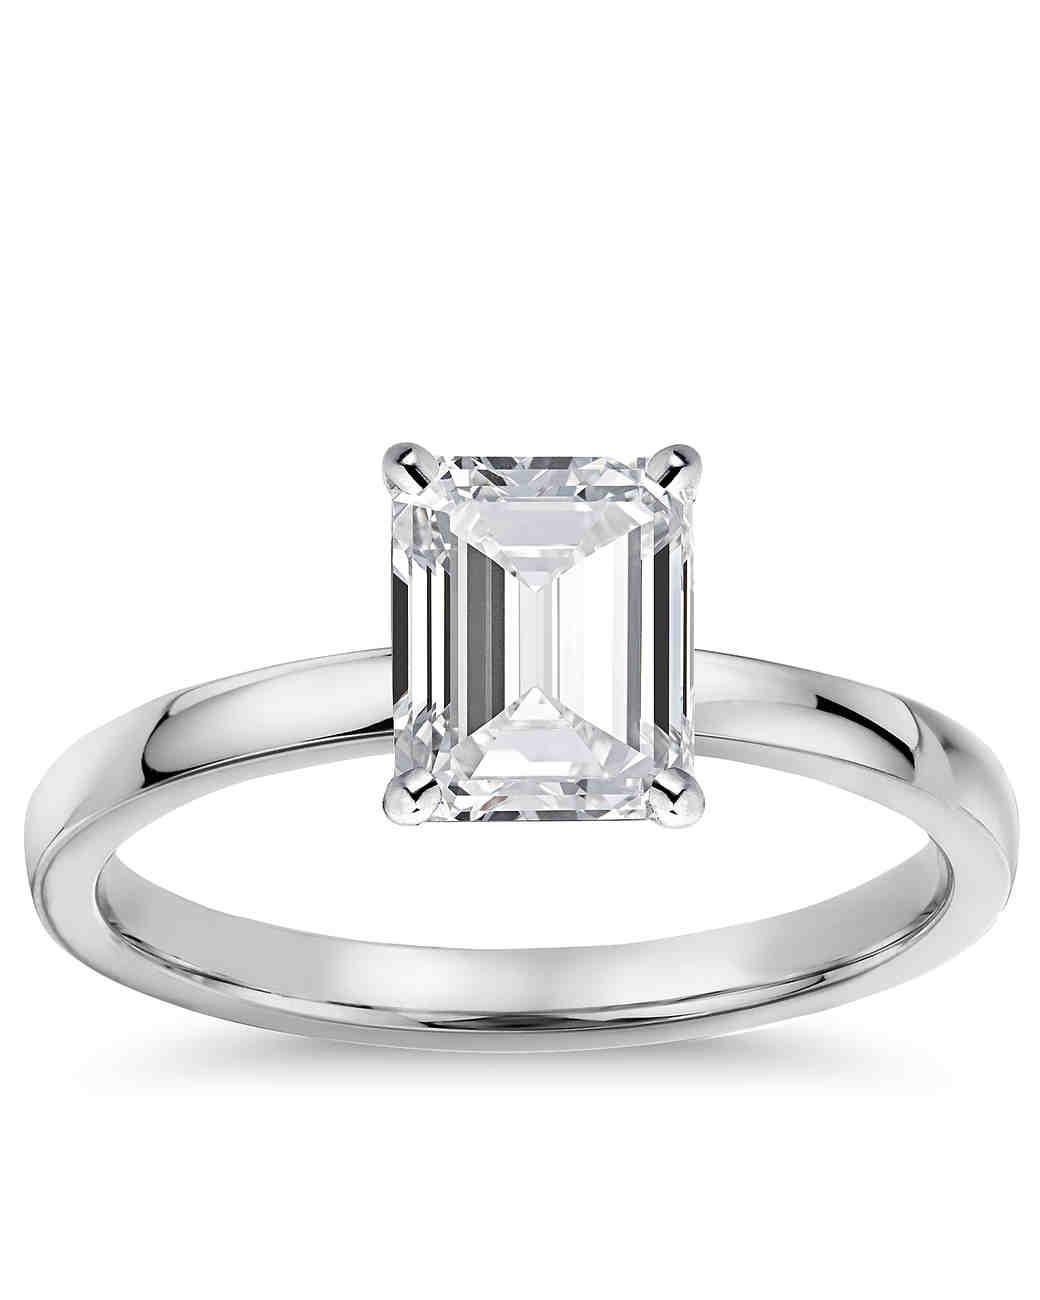 Blue Nile Emeraldcut Engagement Ring